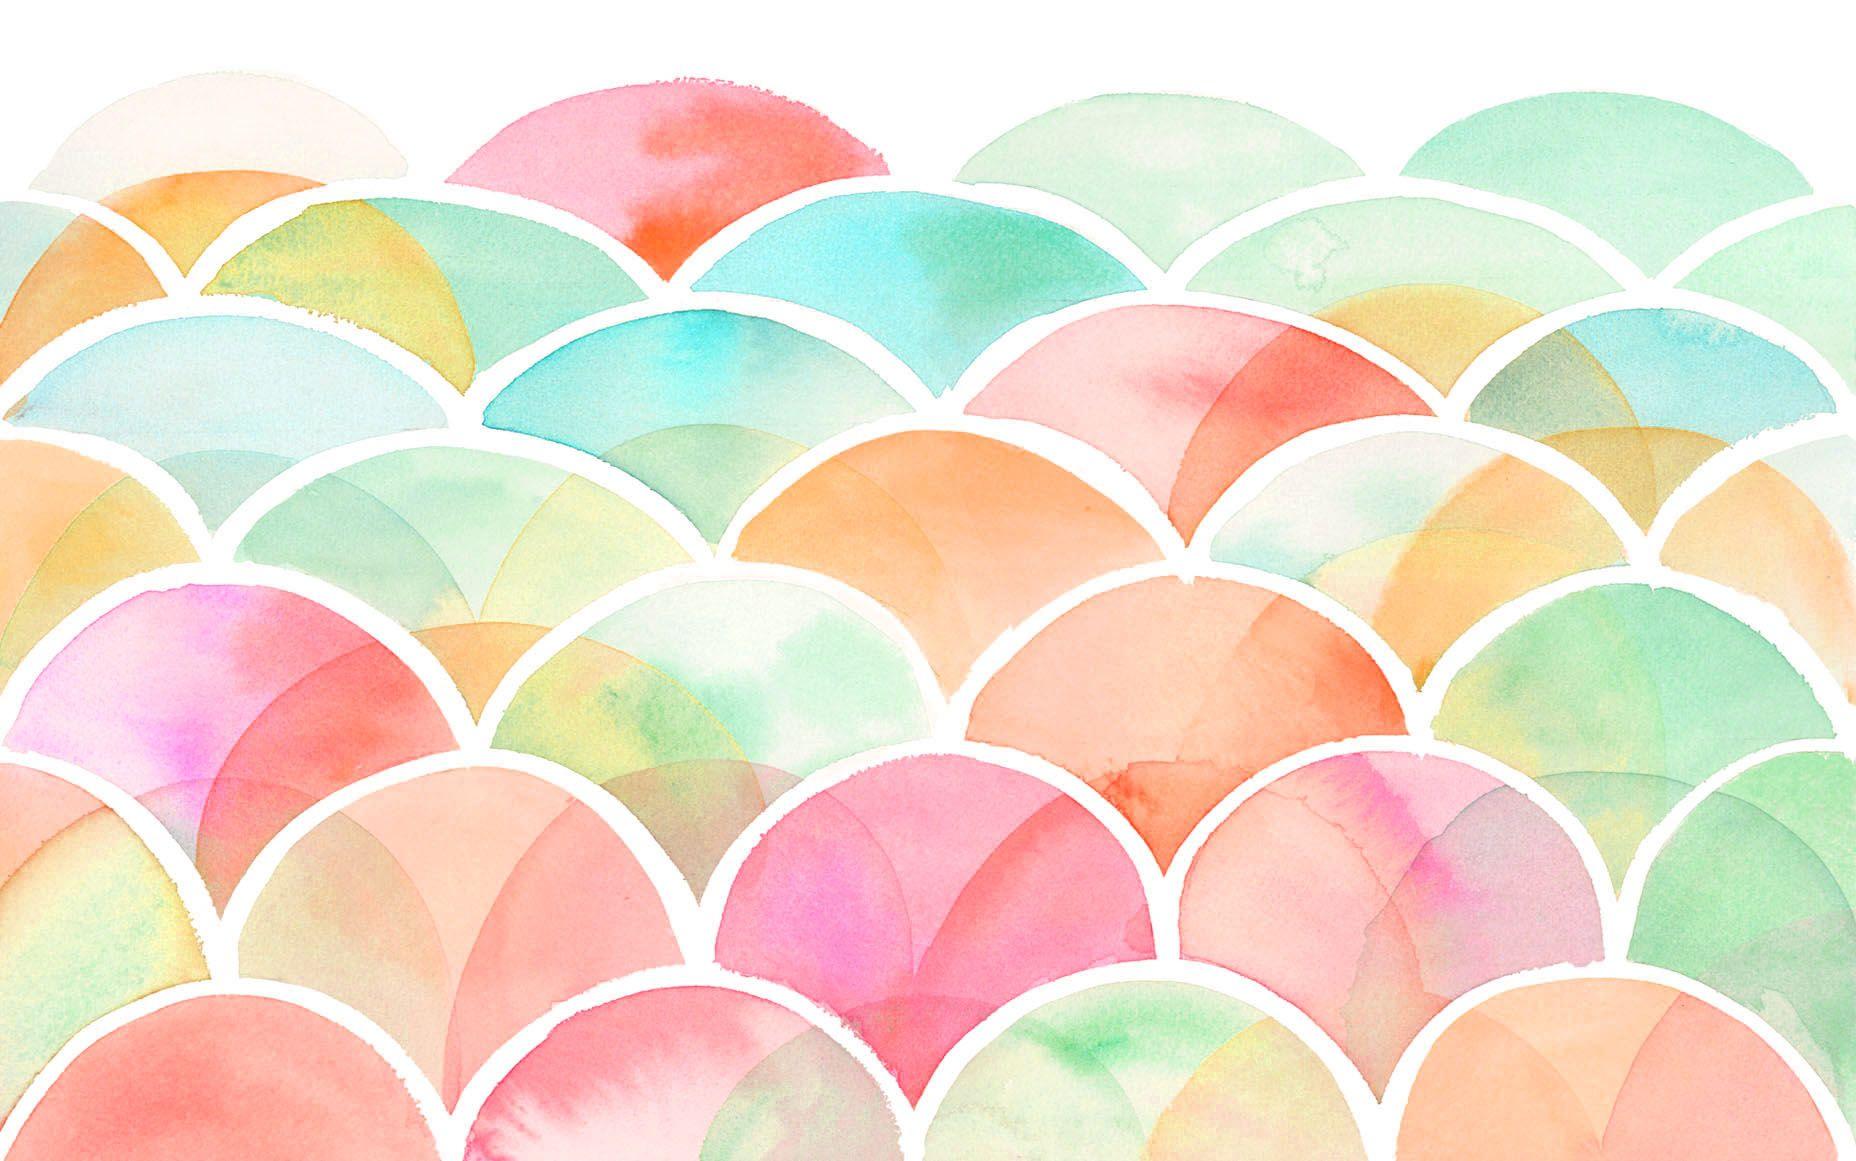 desktop backgrounds pinterest - photo #41